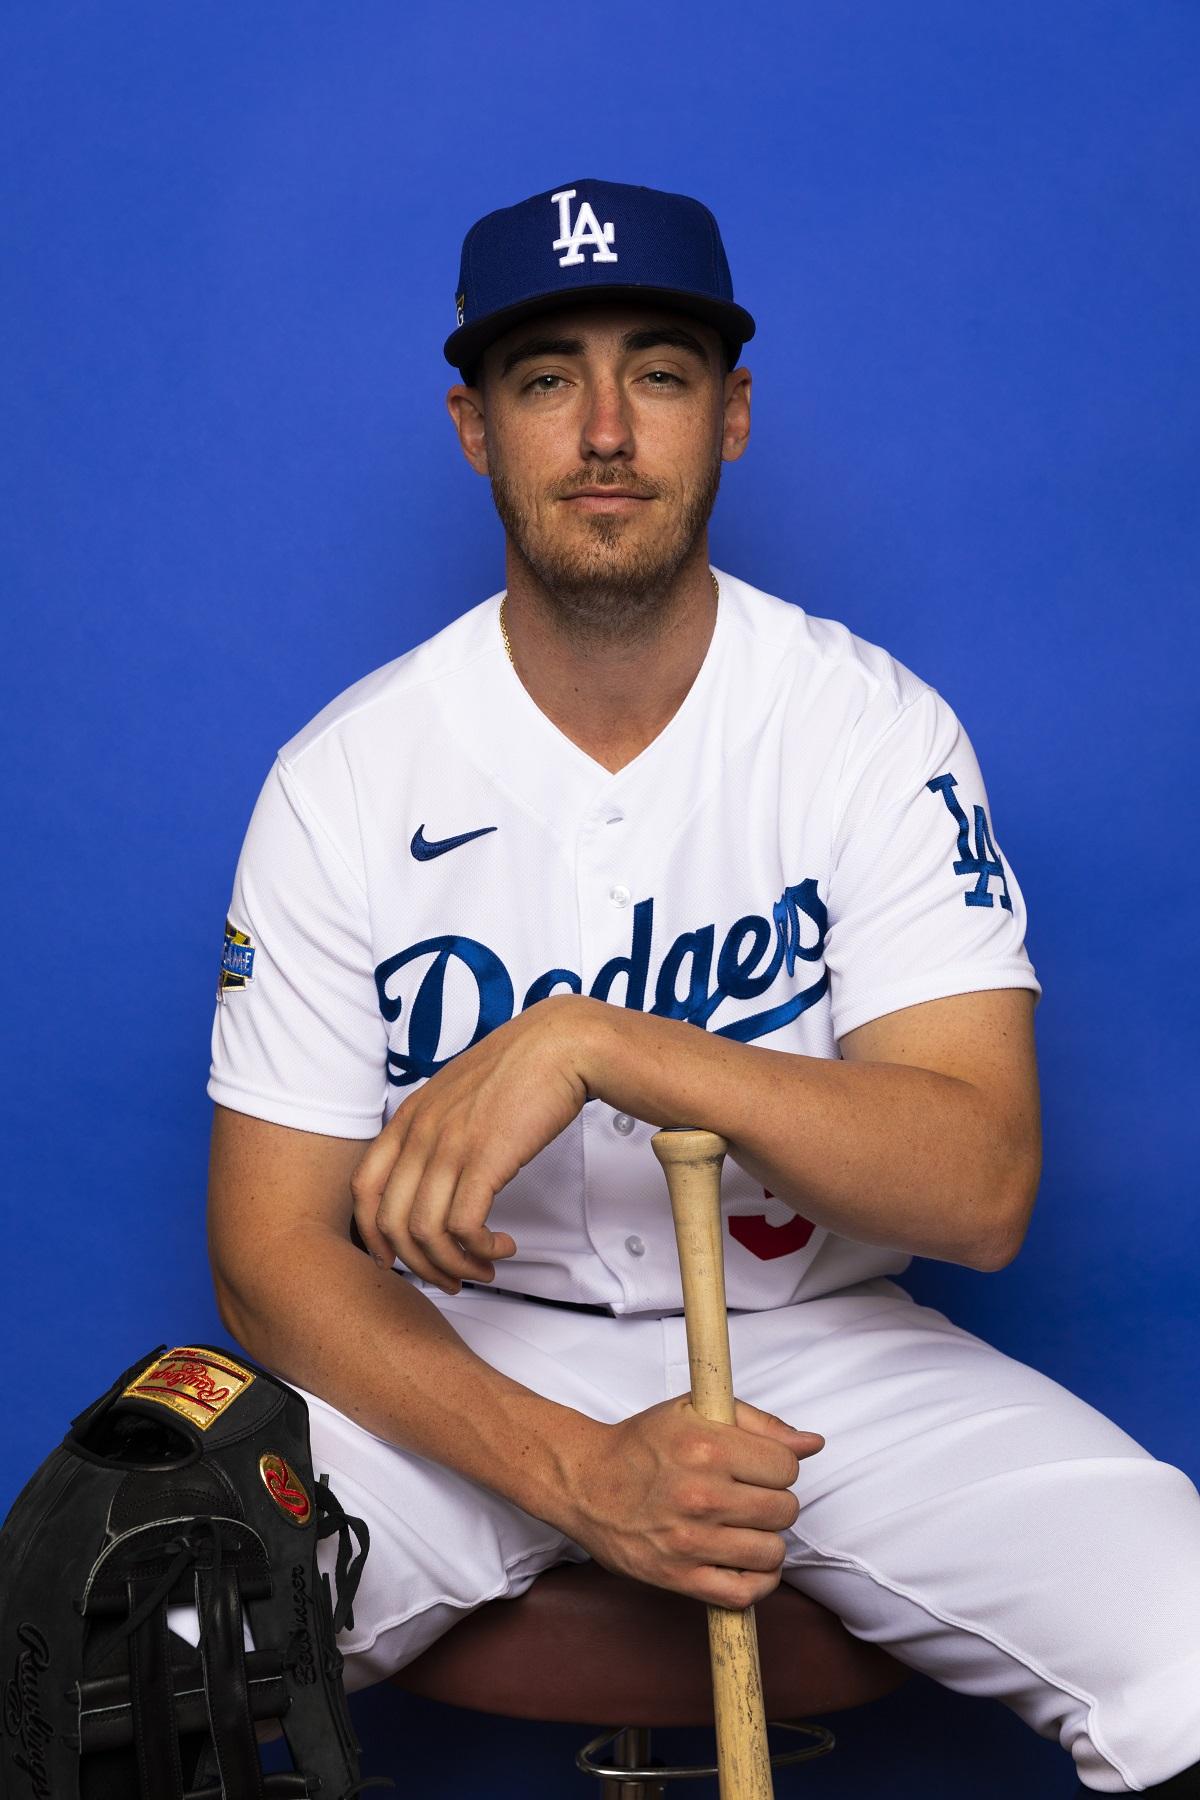 Dodgers' Bellinger Glad to Put Offseason Drama Behind Him